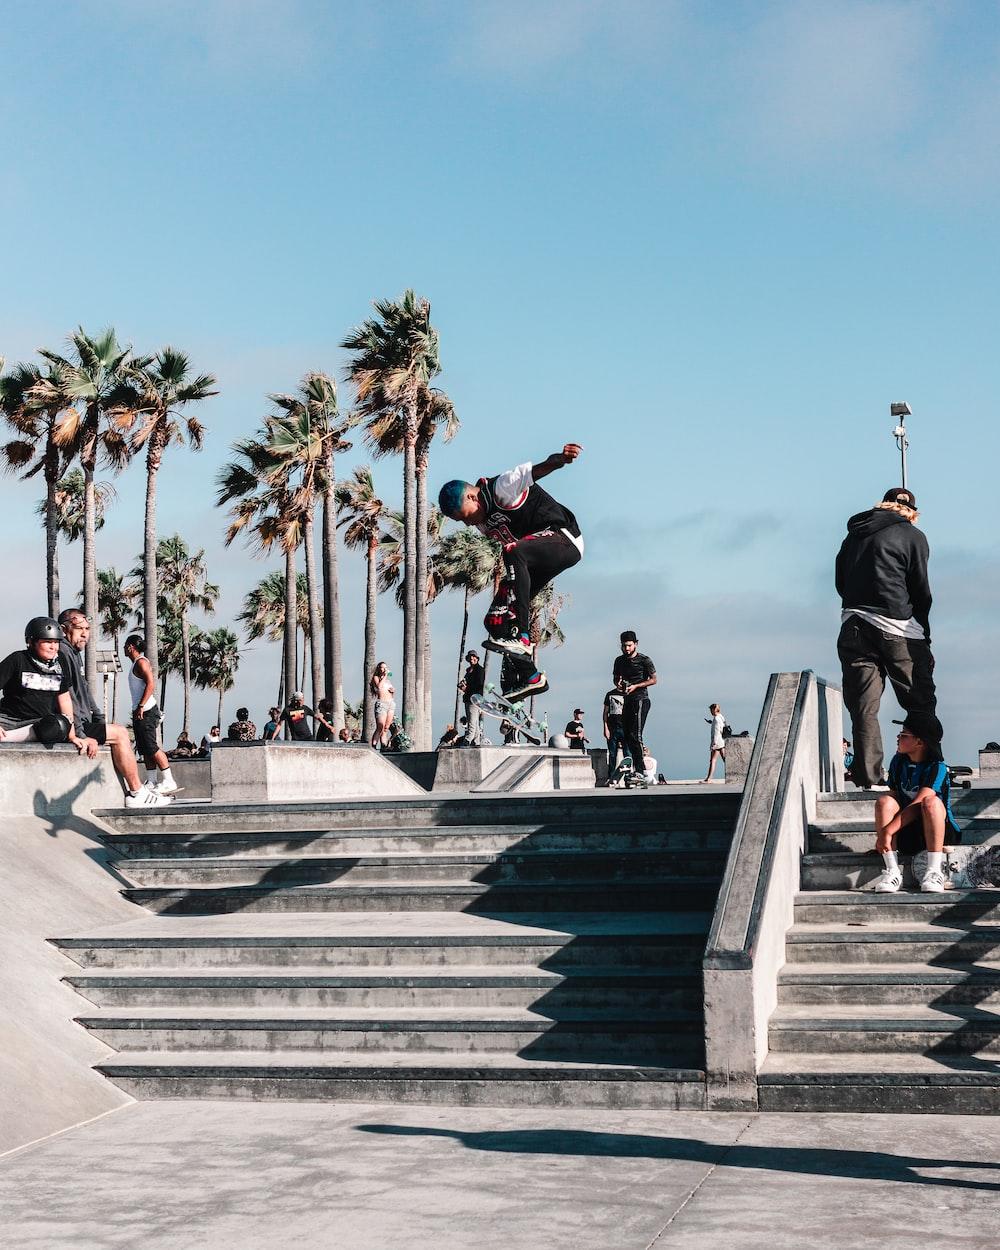 people walking on concrete stairs during daytime